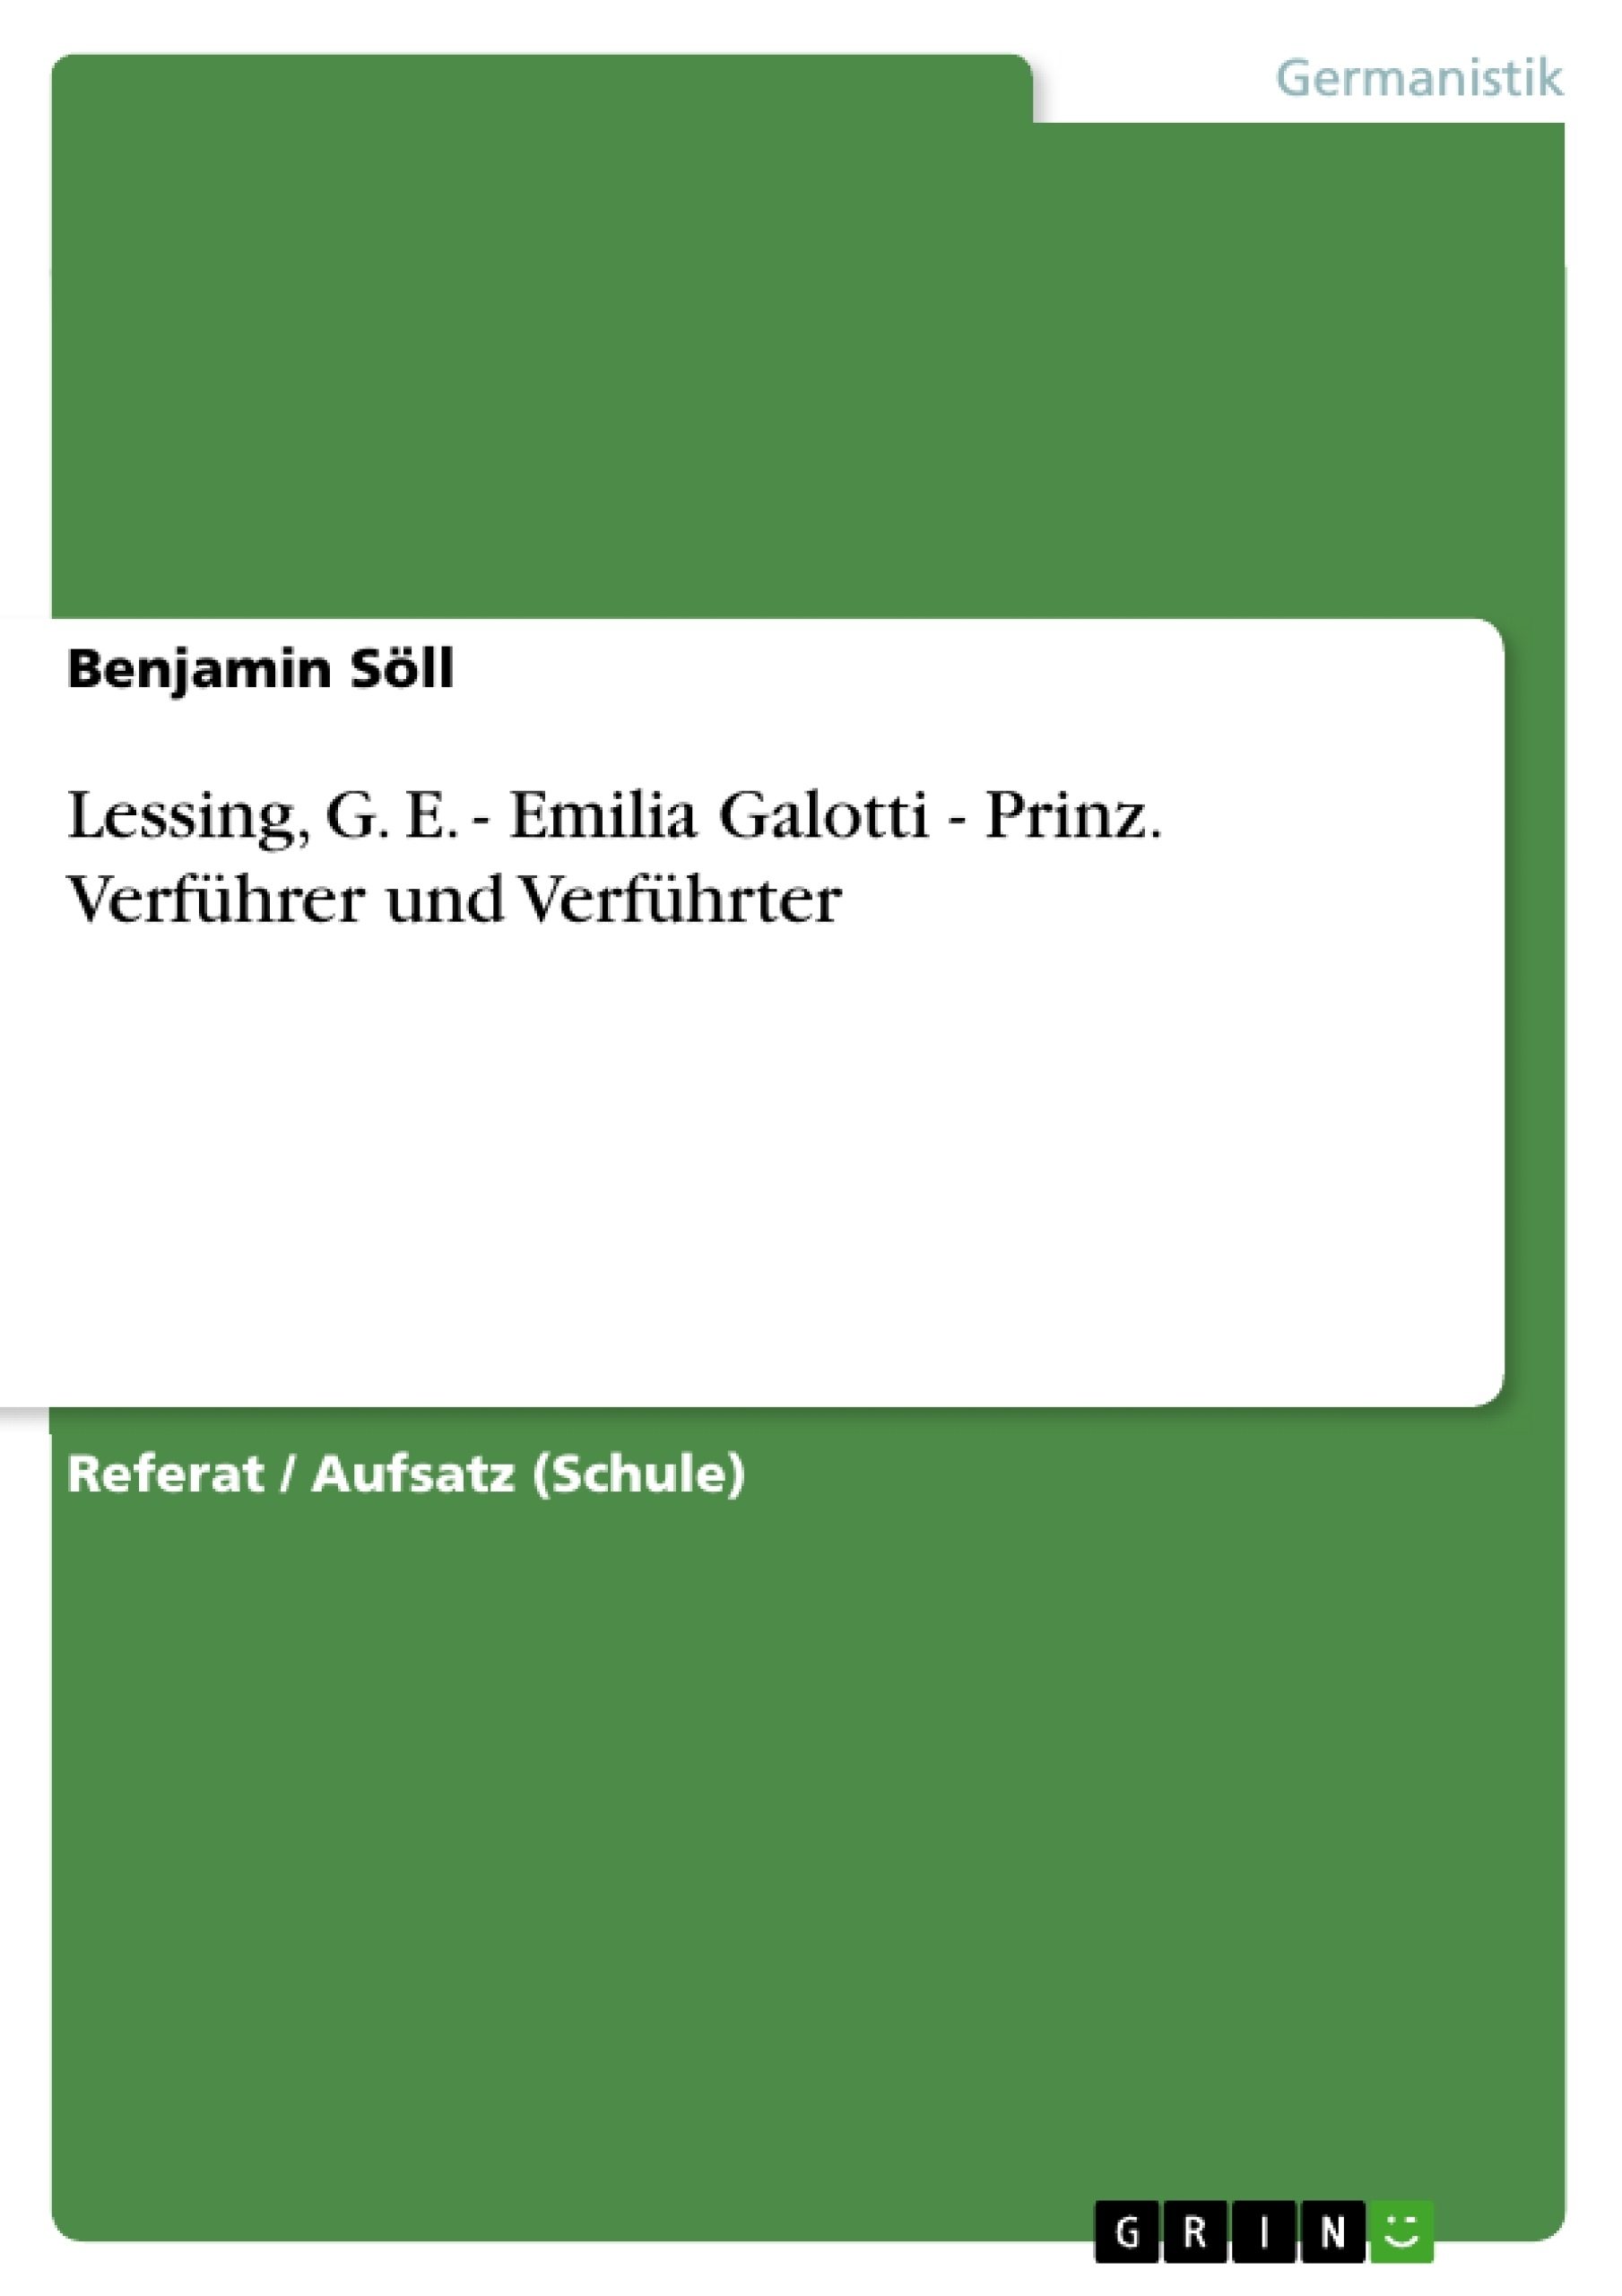 Titel: Lessing, G. E. - Emilia Galotti - Prinz. Verführer und Verführter